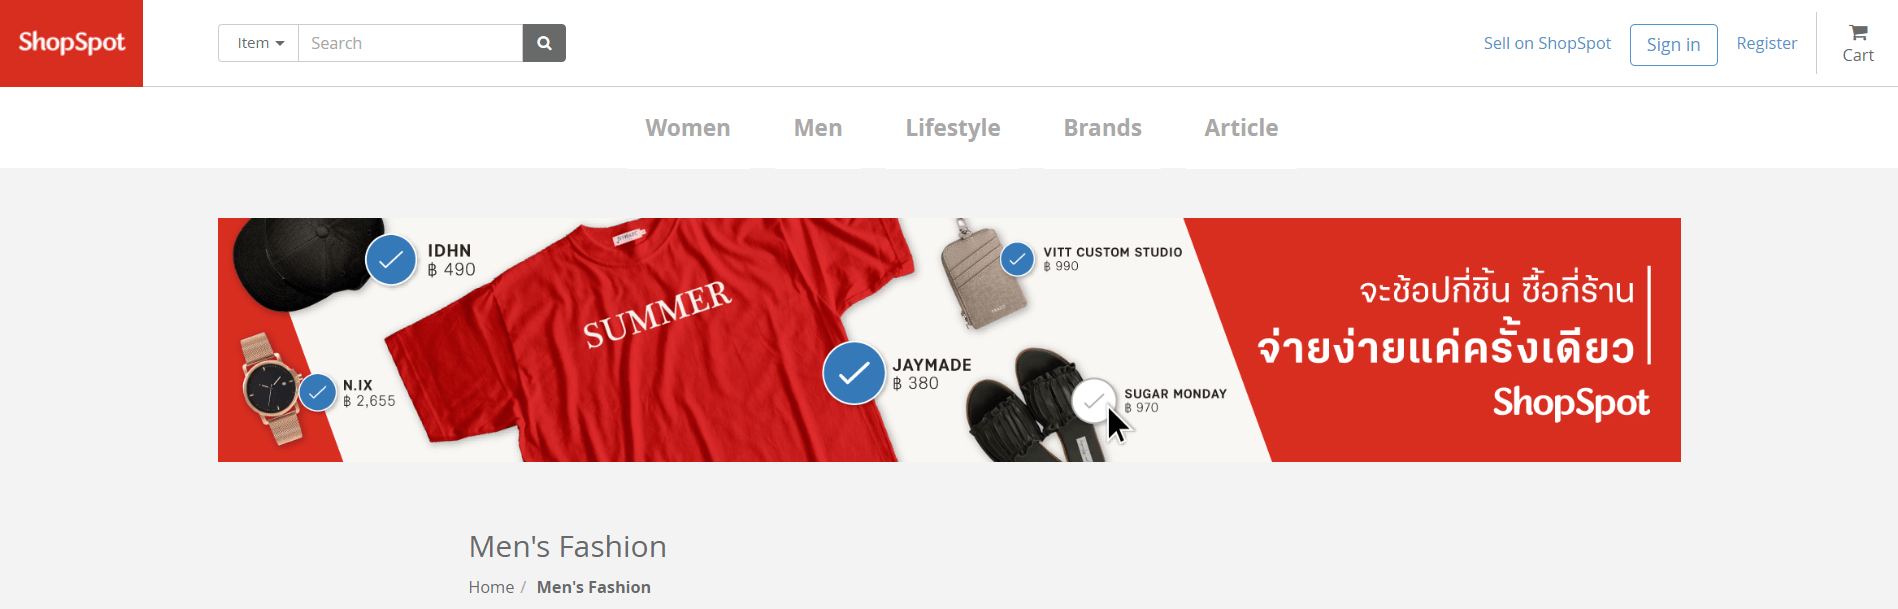 ShopSpot-fashion-online-shopping-for-men